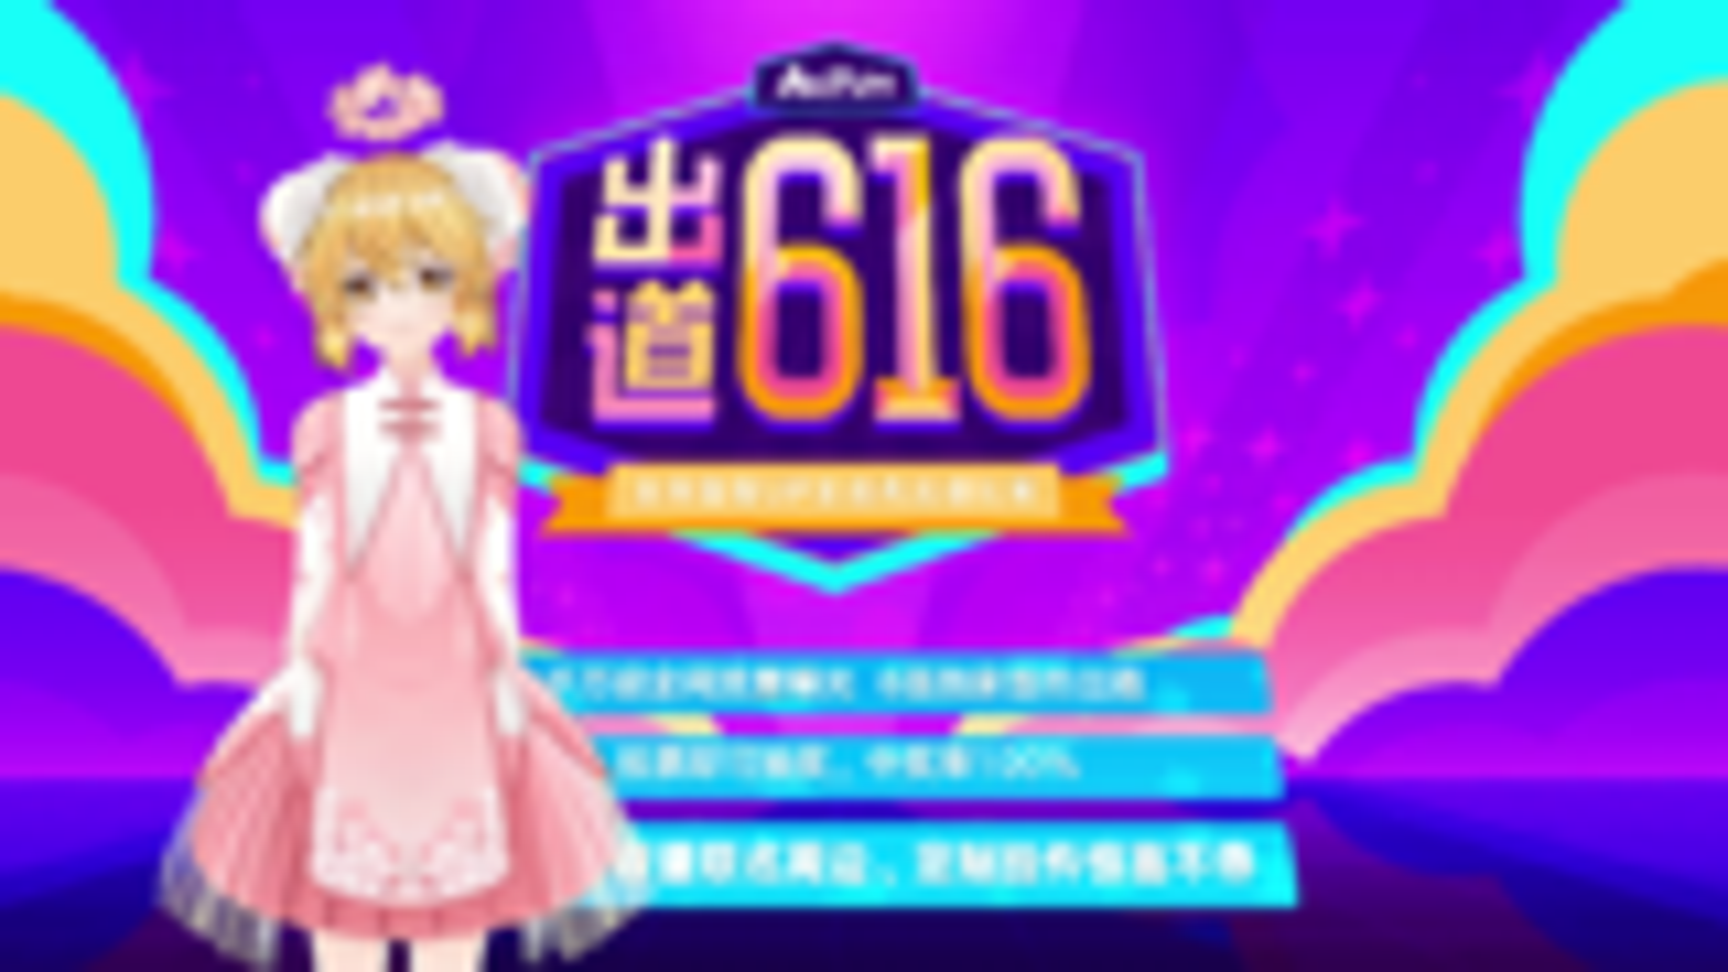 【AC娘】全网首届up选秀大赛开启!投票即抽奖的【出道616】你还在等什么?